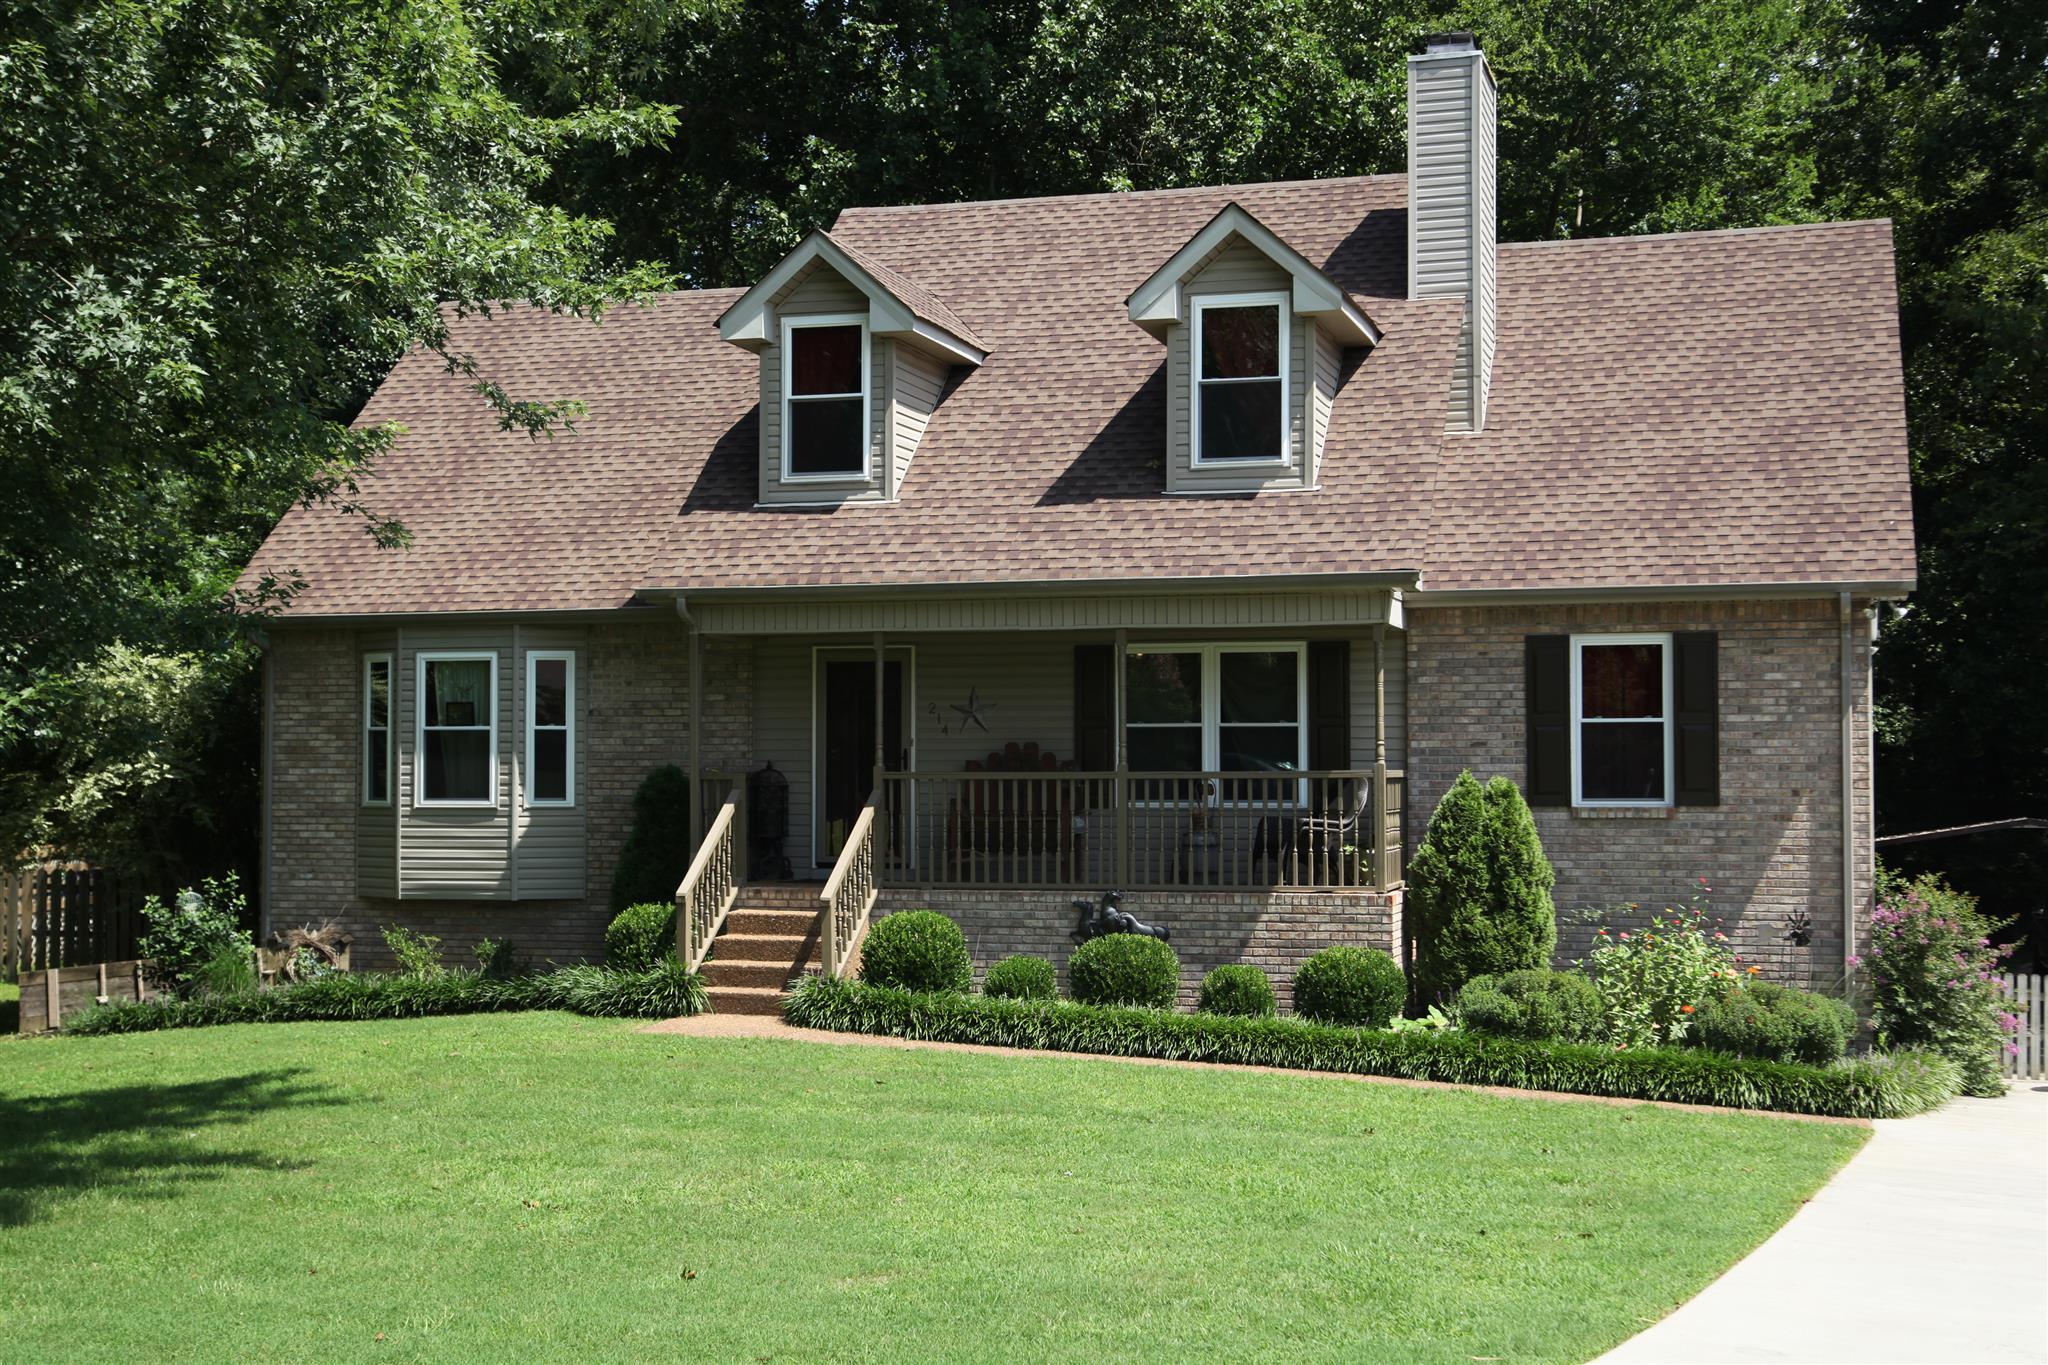 214 Beechbrook Ct, White House, TN 37188